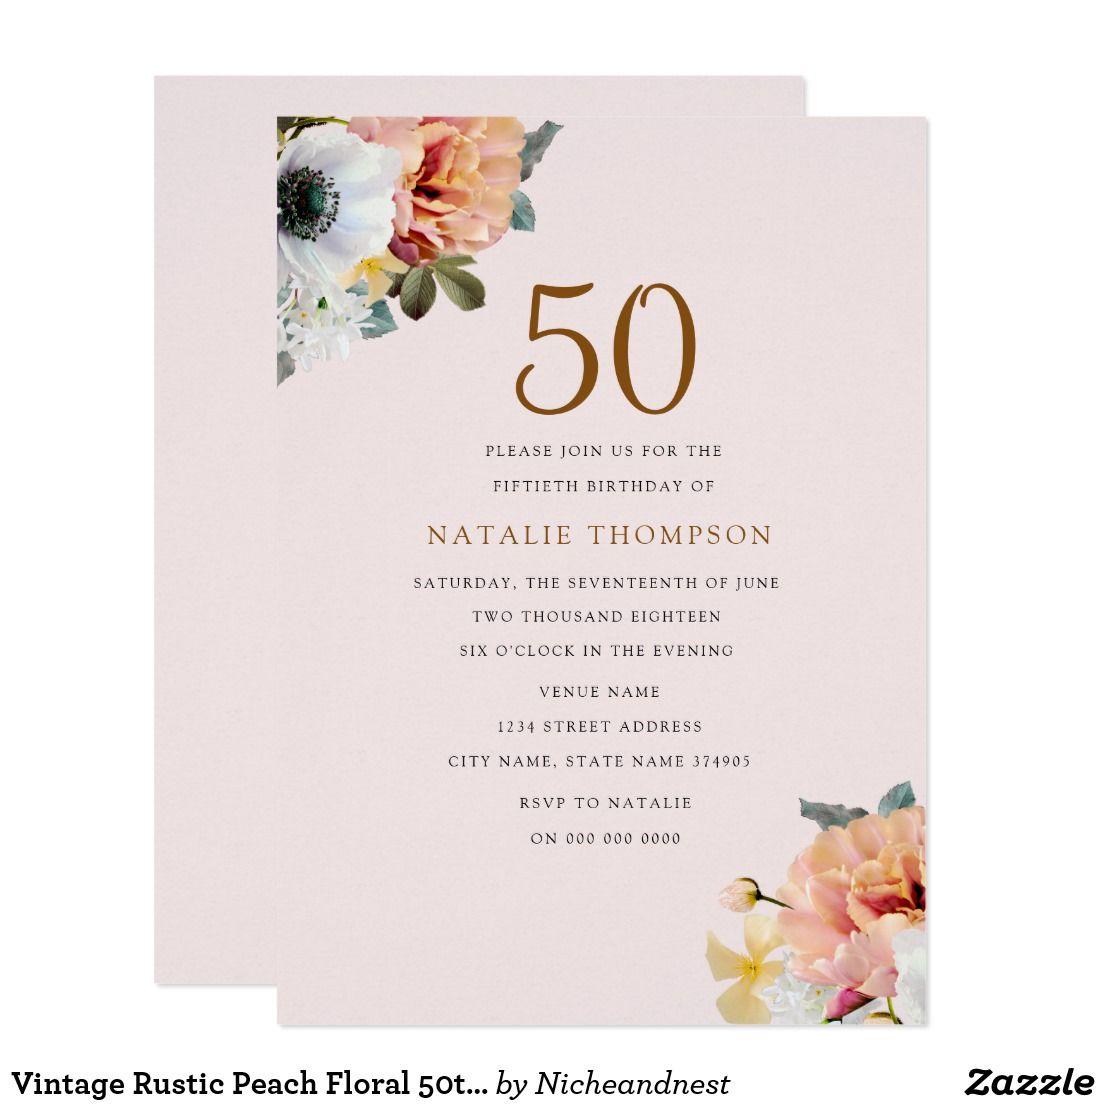 Vintage Rustic Peach Floral 50th Birthday Invite | 50 birthday ...